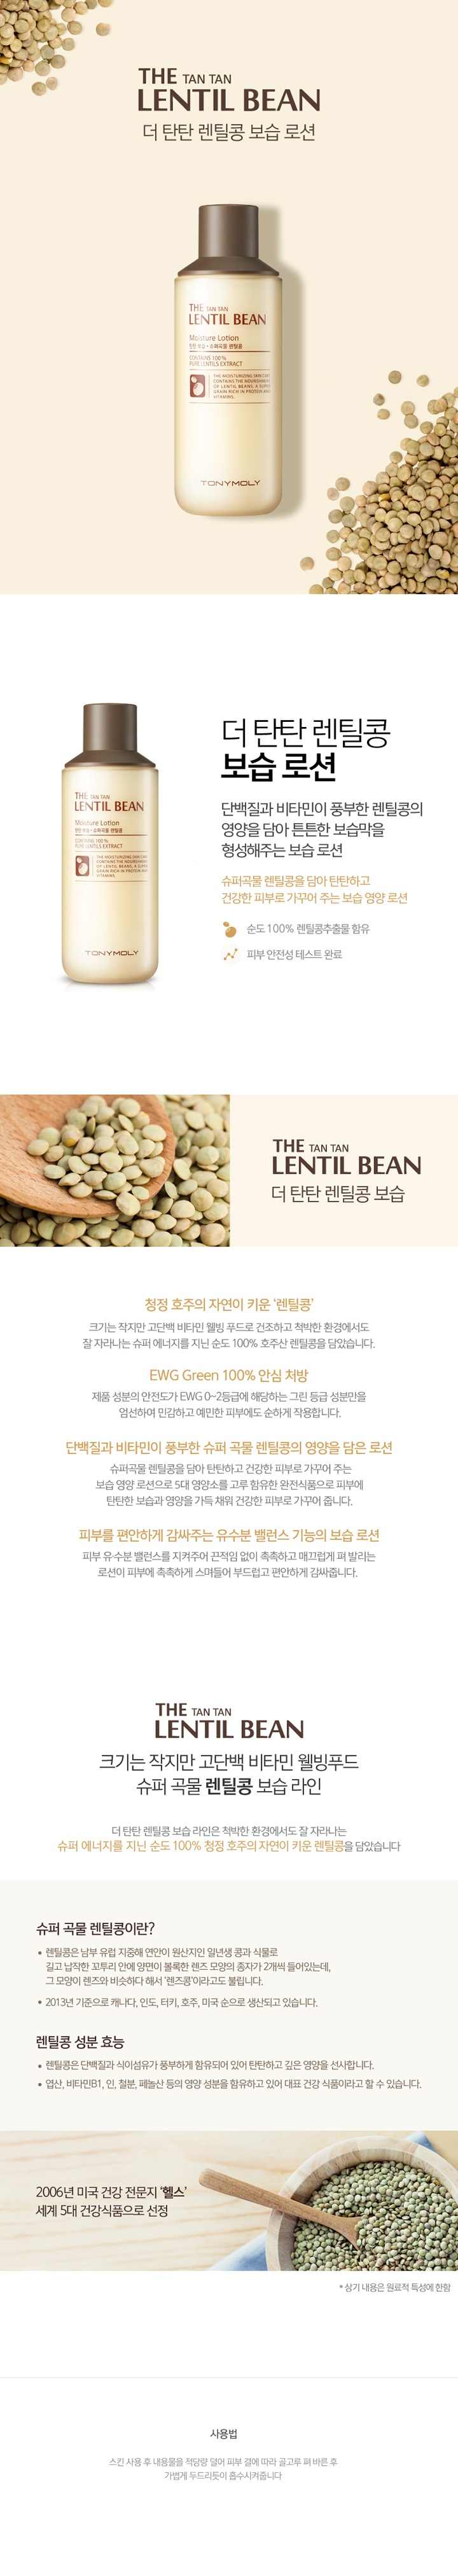 Tony Moly The Tan Tan Lentil Bean Moisture Set korean cosmetic skincare product online shop malaysia italy germany2